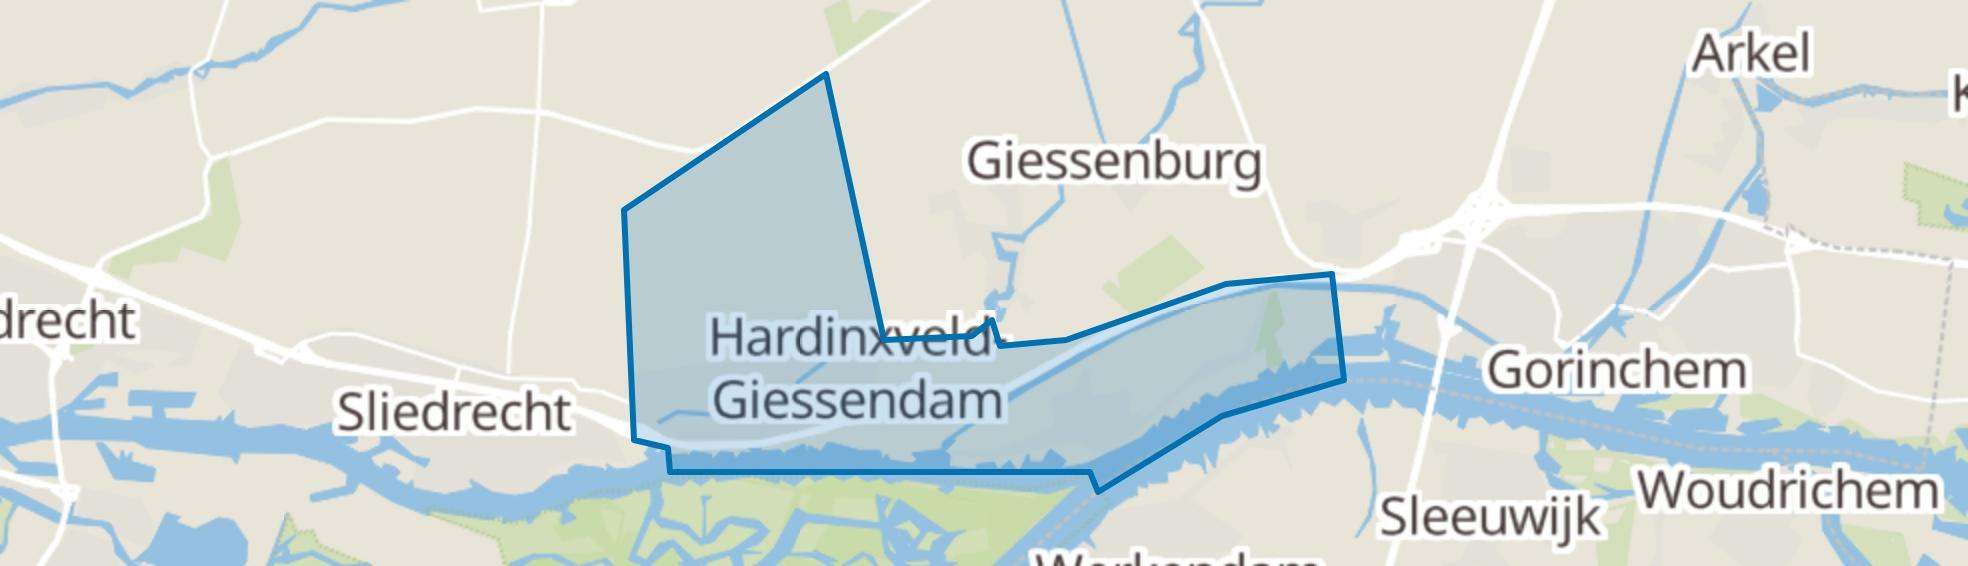 Hardinxveld-Giessendam map